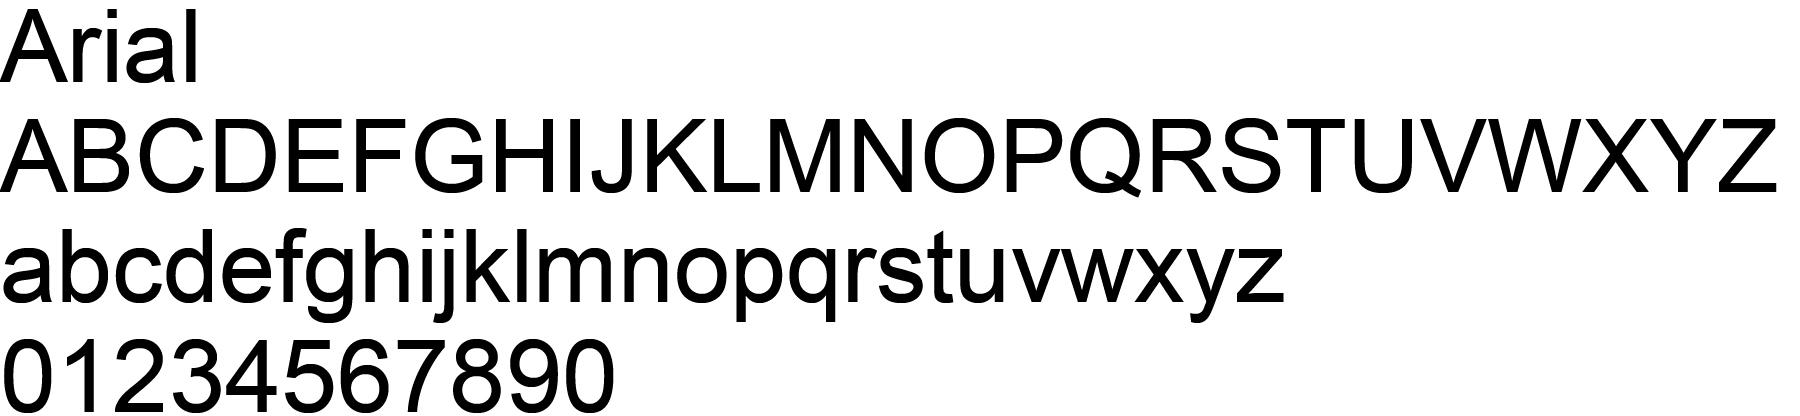 Typography - University of Suffolk